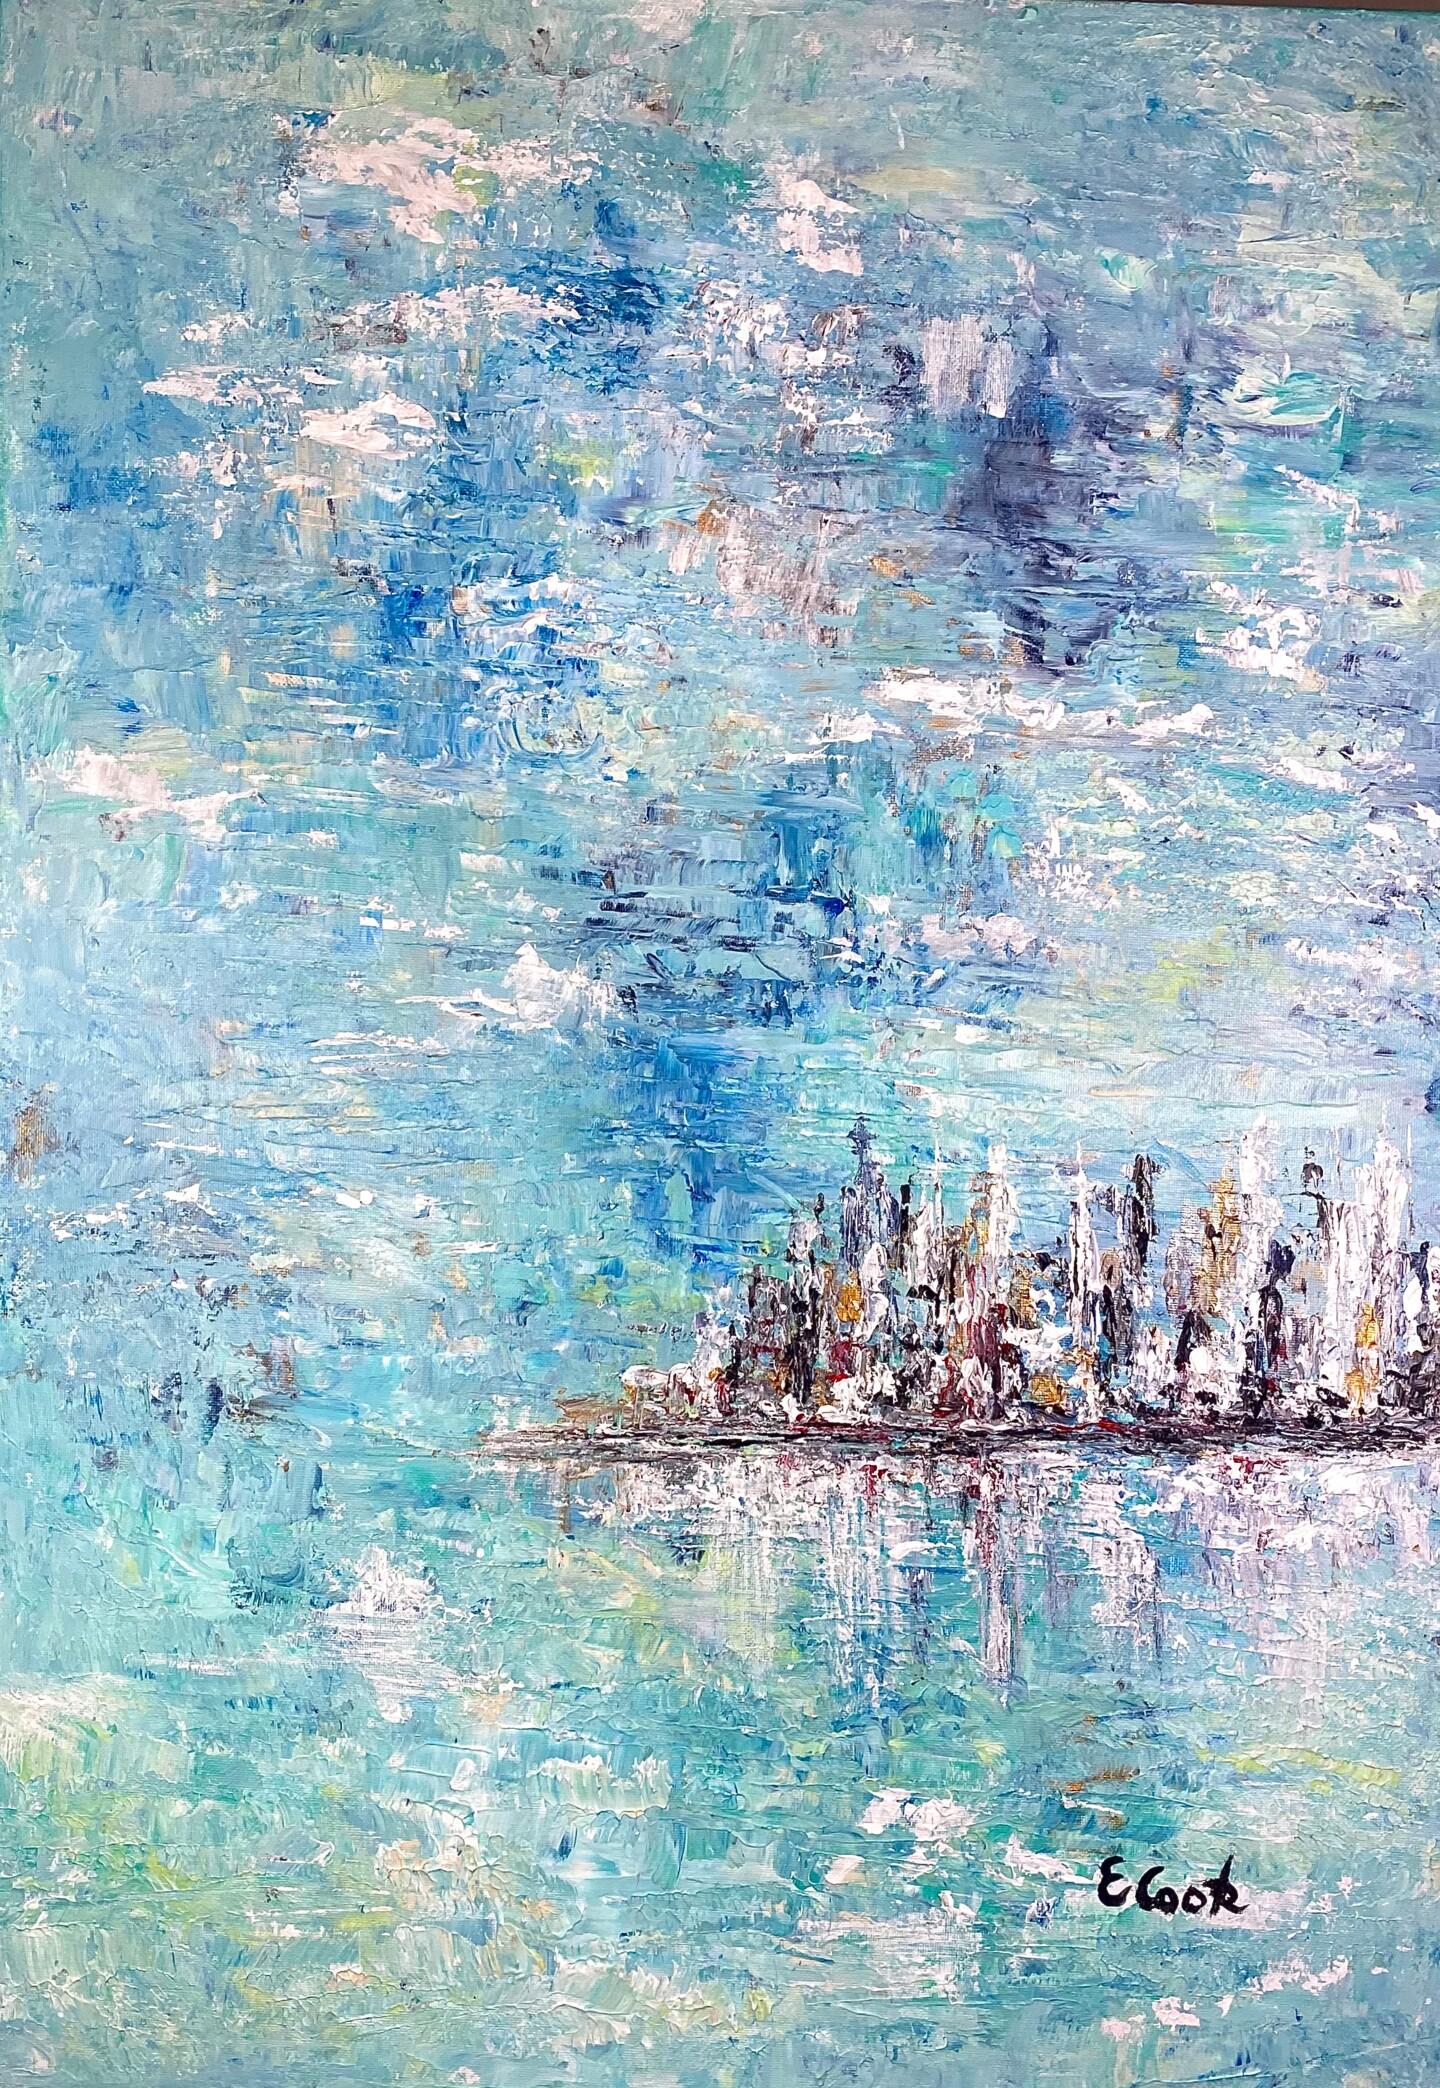 Elisa Cook - Aquamarine Seascape